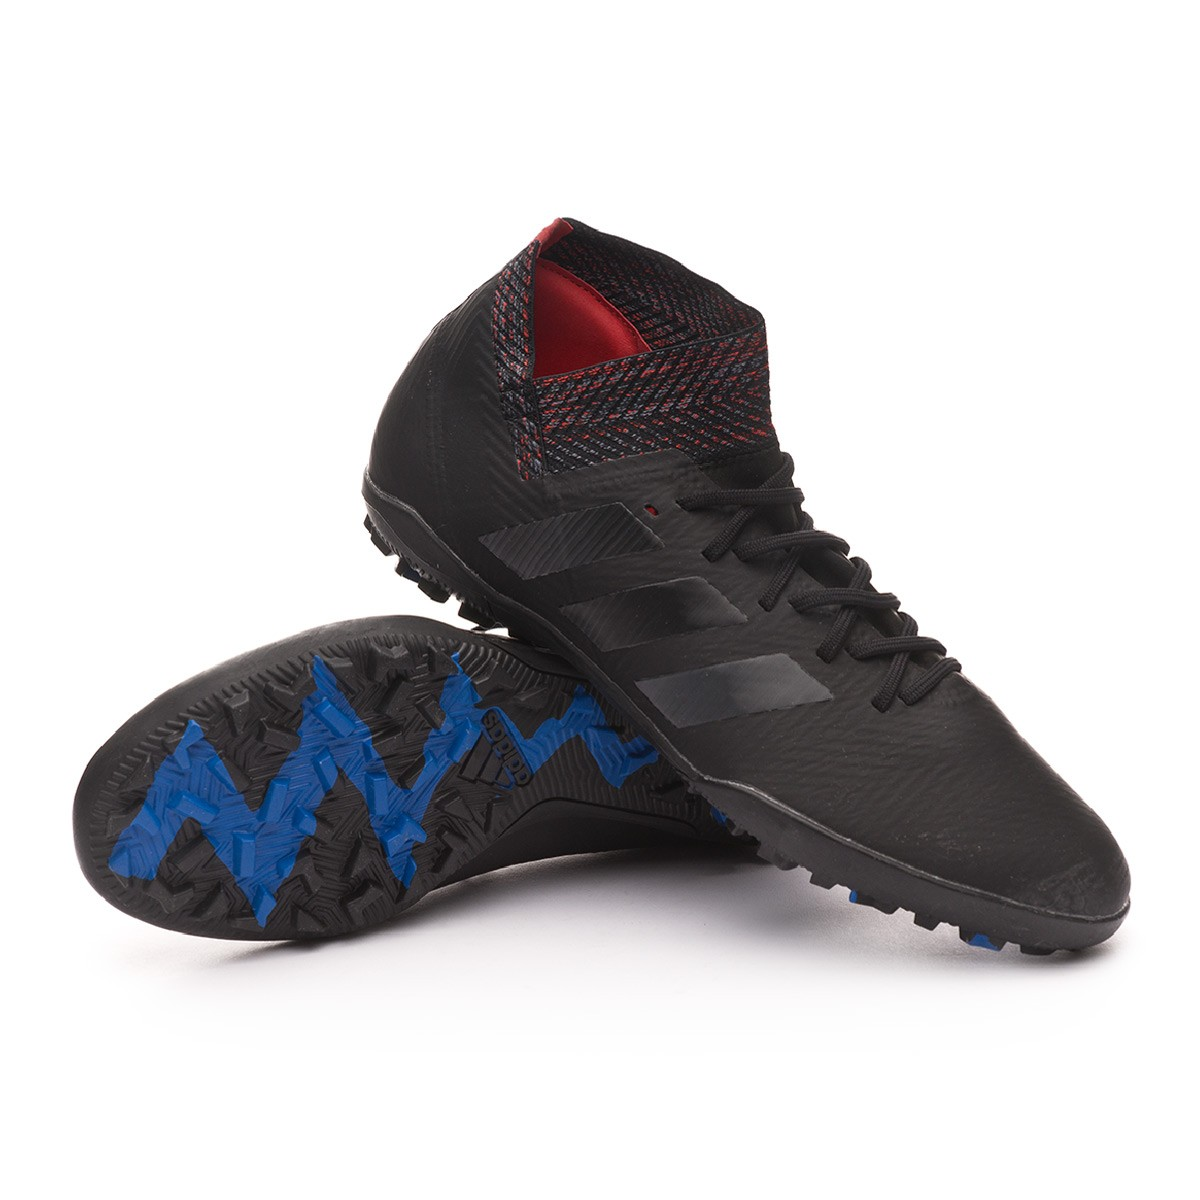 6add3a281 Football Boot adidas Nemeziz Tango 18.3 Turf Core black-Football ...